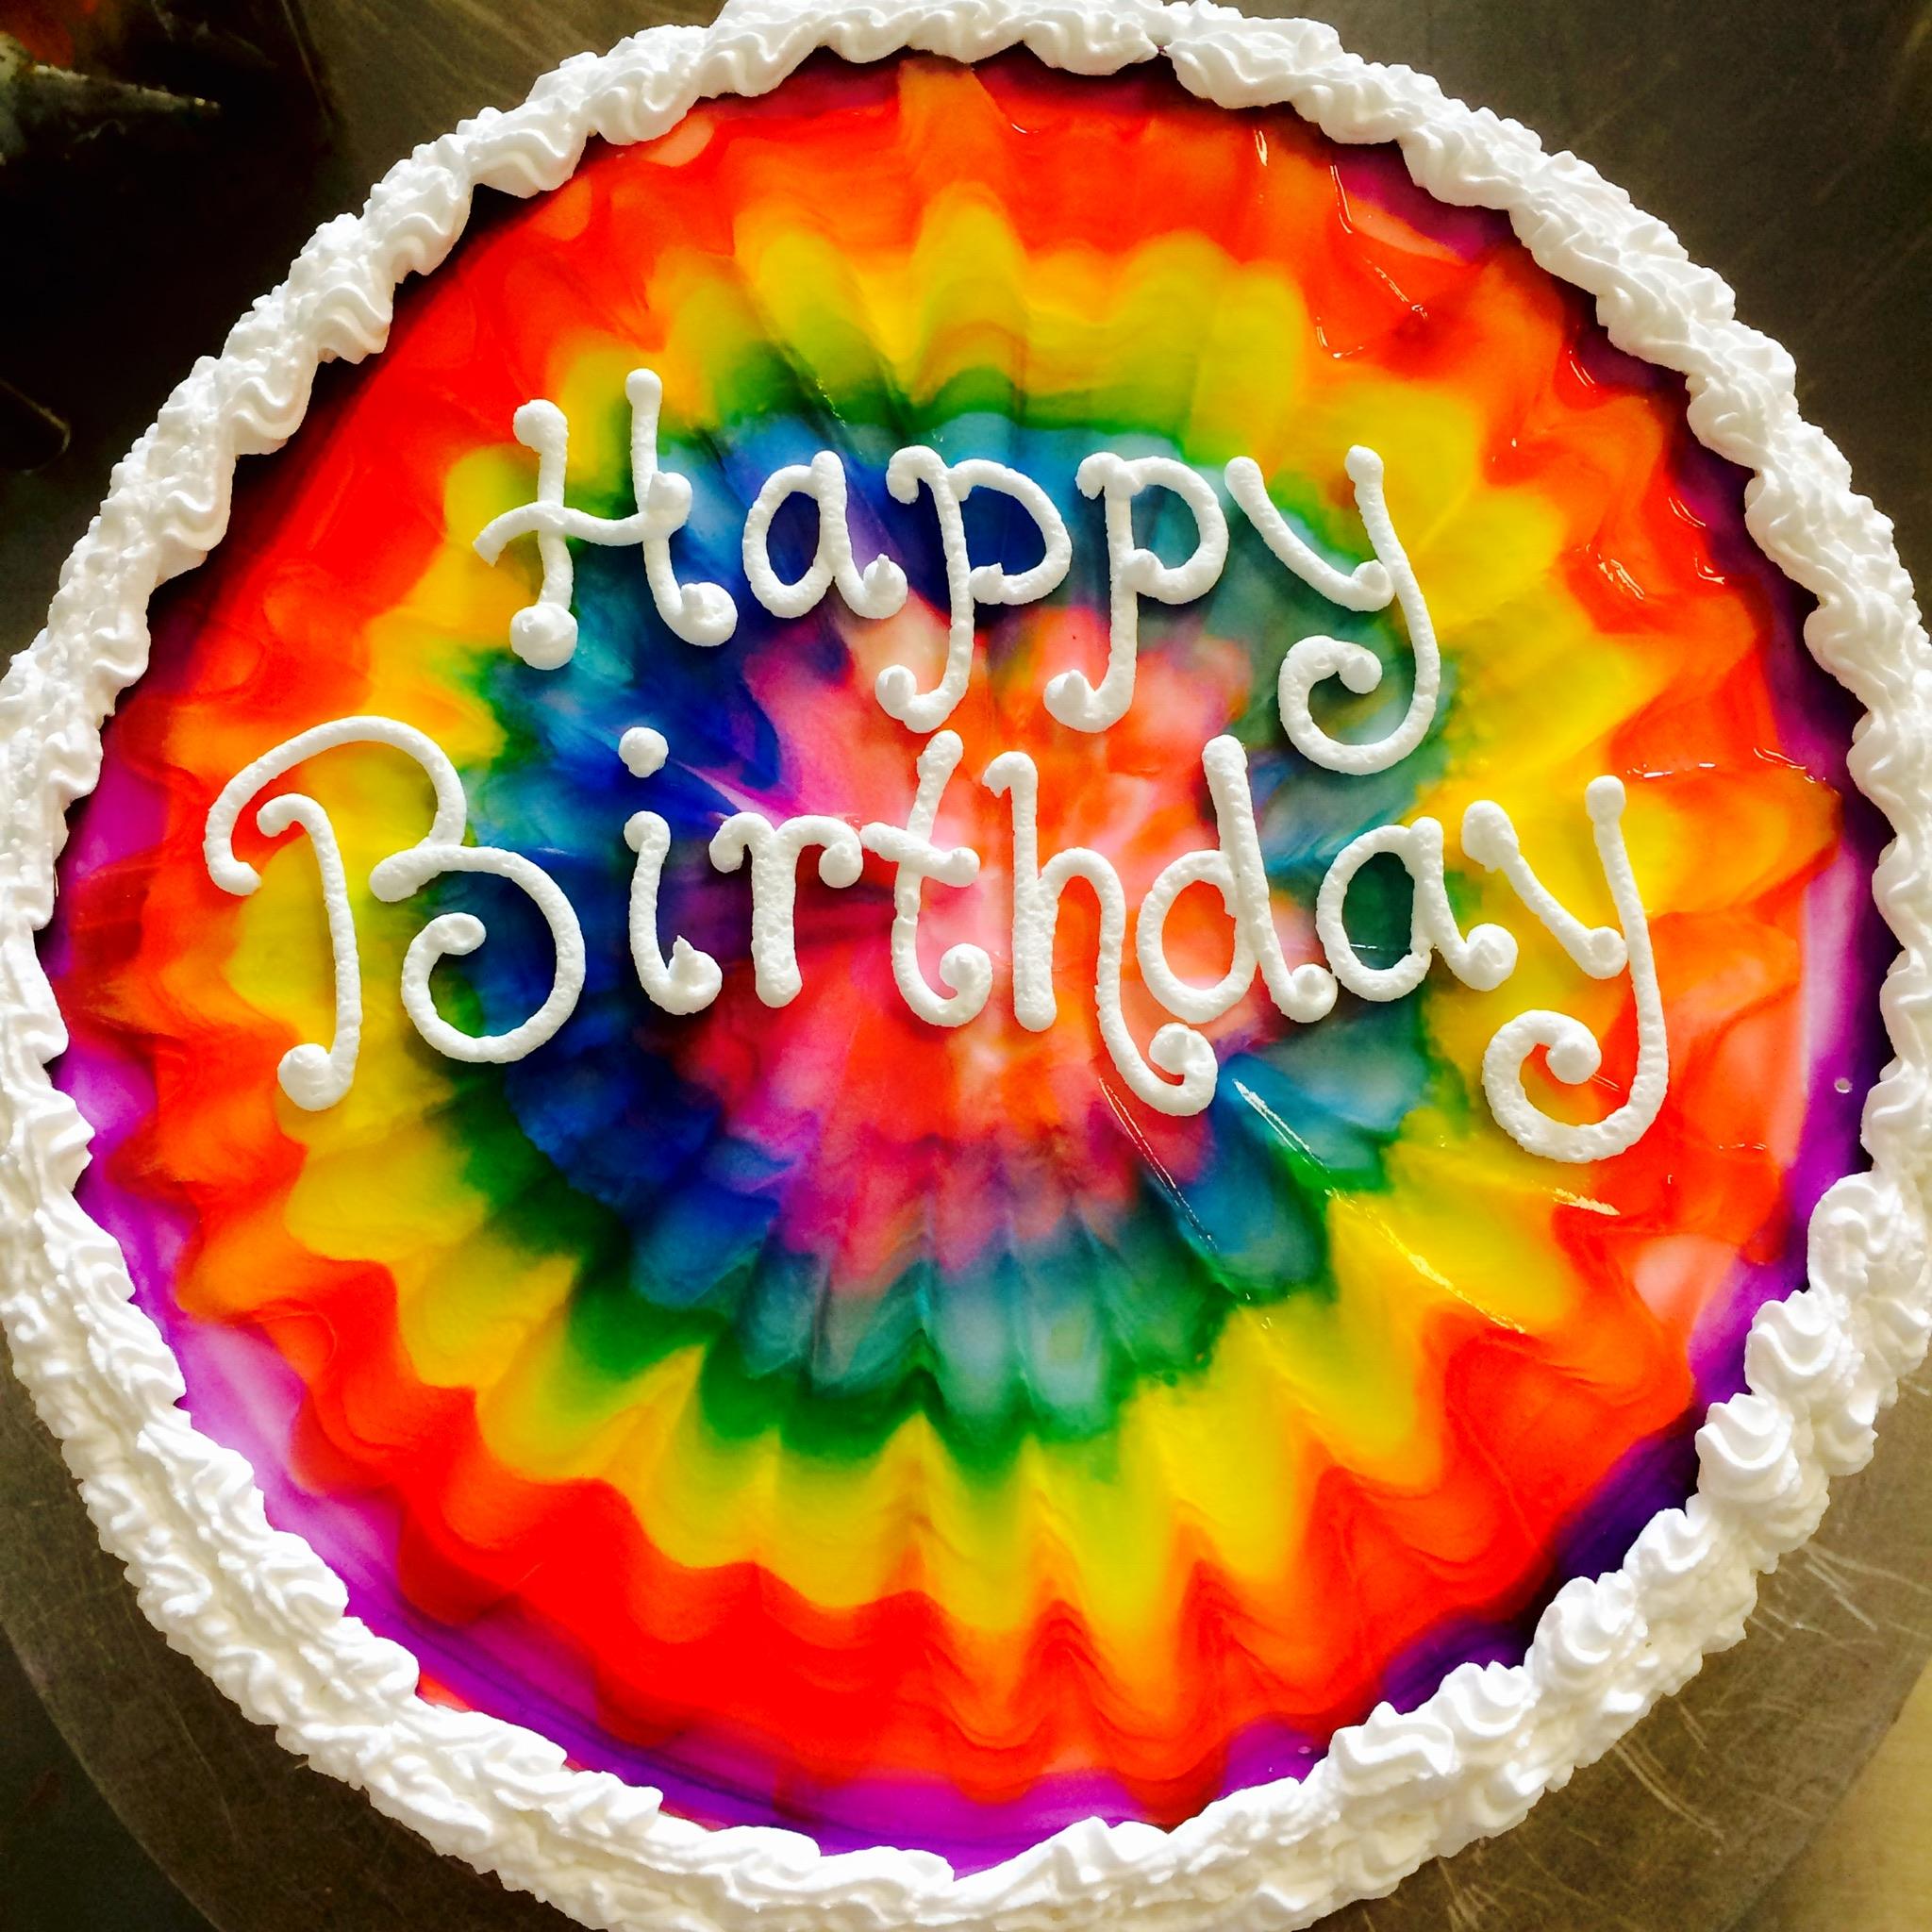 Cake Design #3